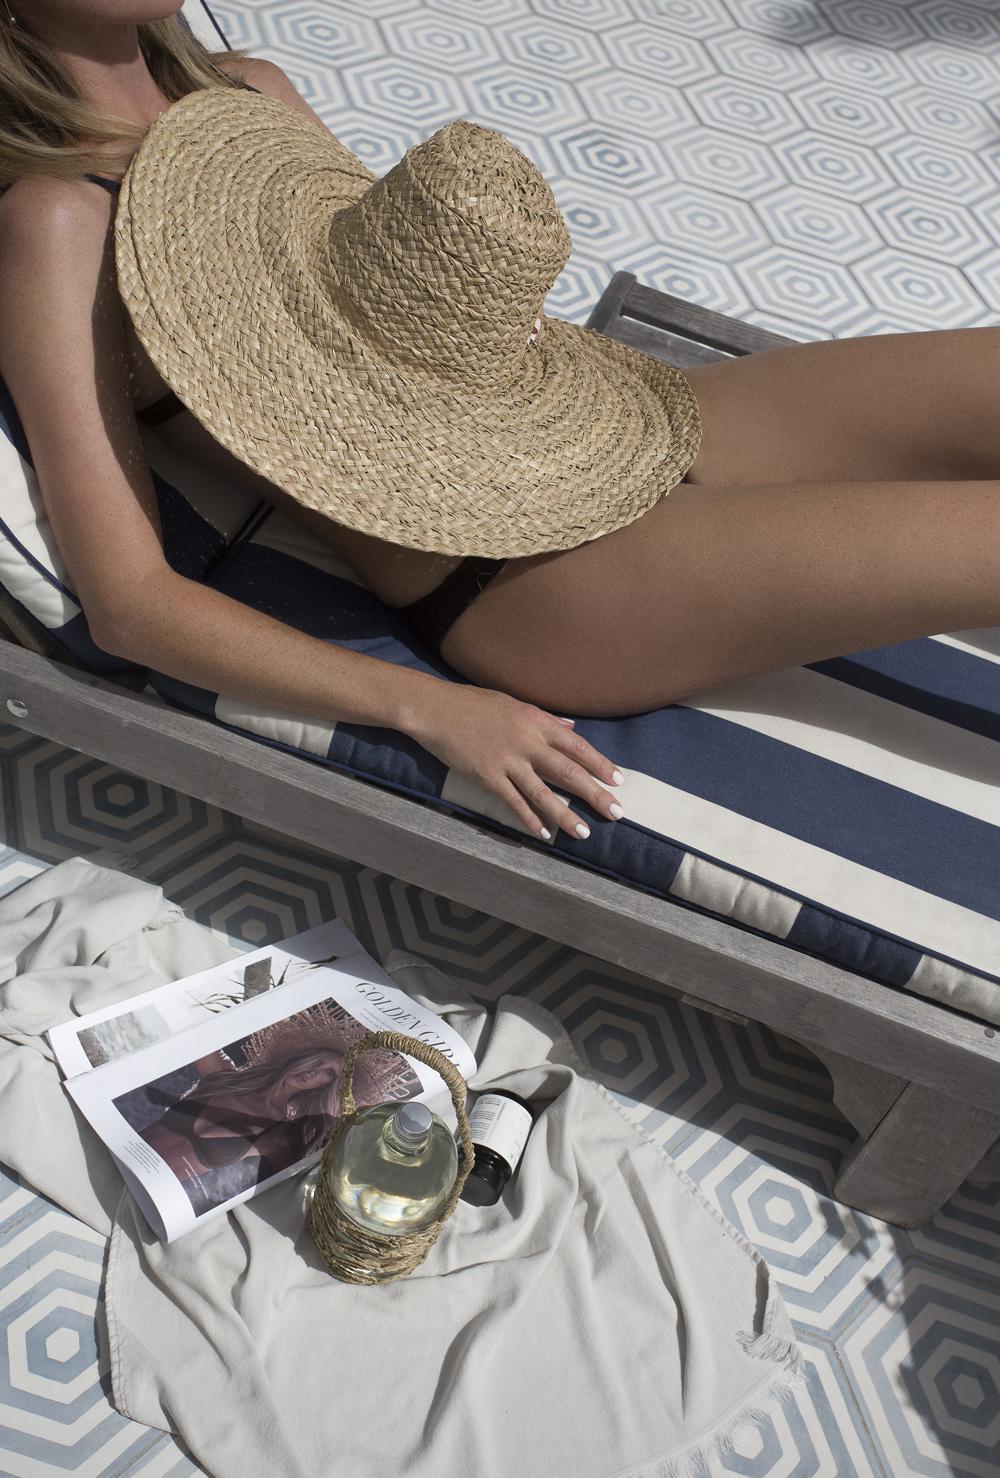 Black Bikini, Black Swimsuit, Straw hat, Beach, Bear Vitamins, Halcyon House, Byron Bay, Oracle Fox